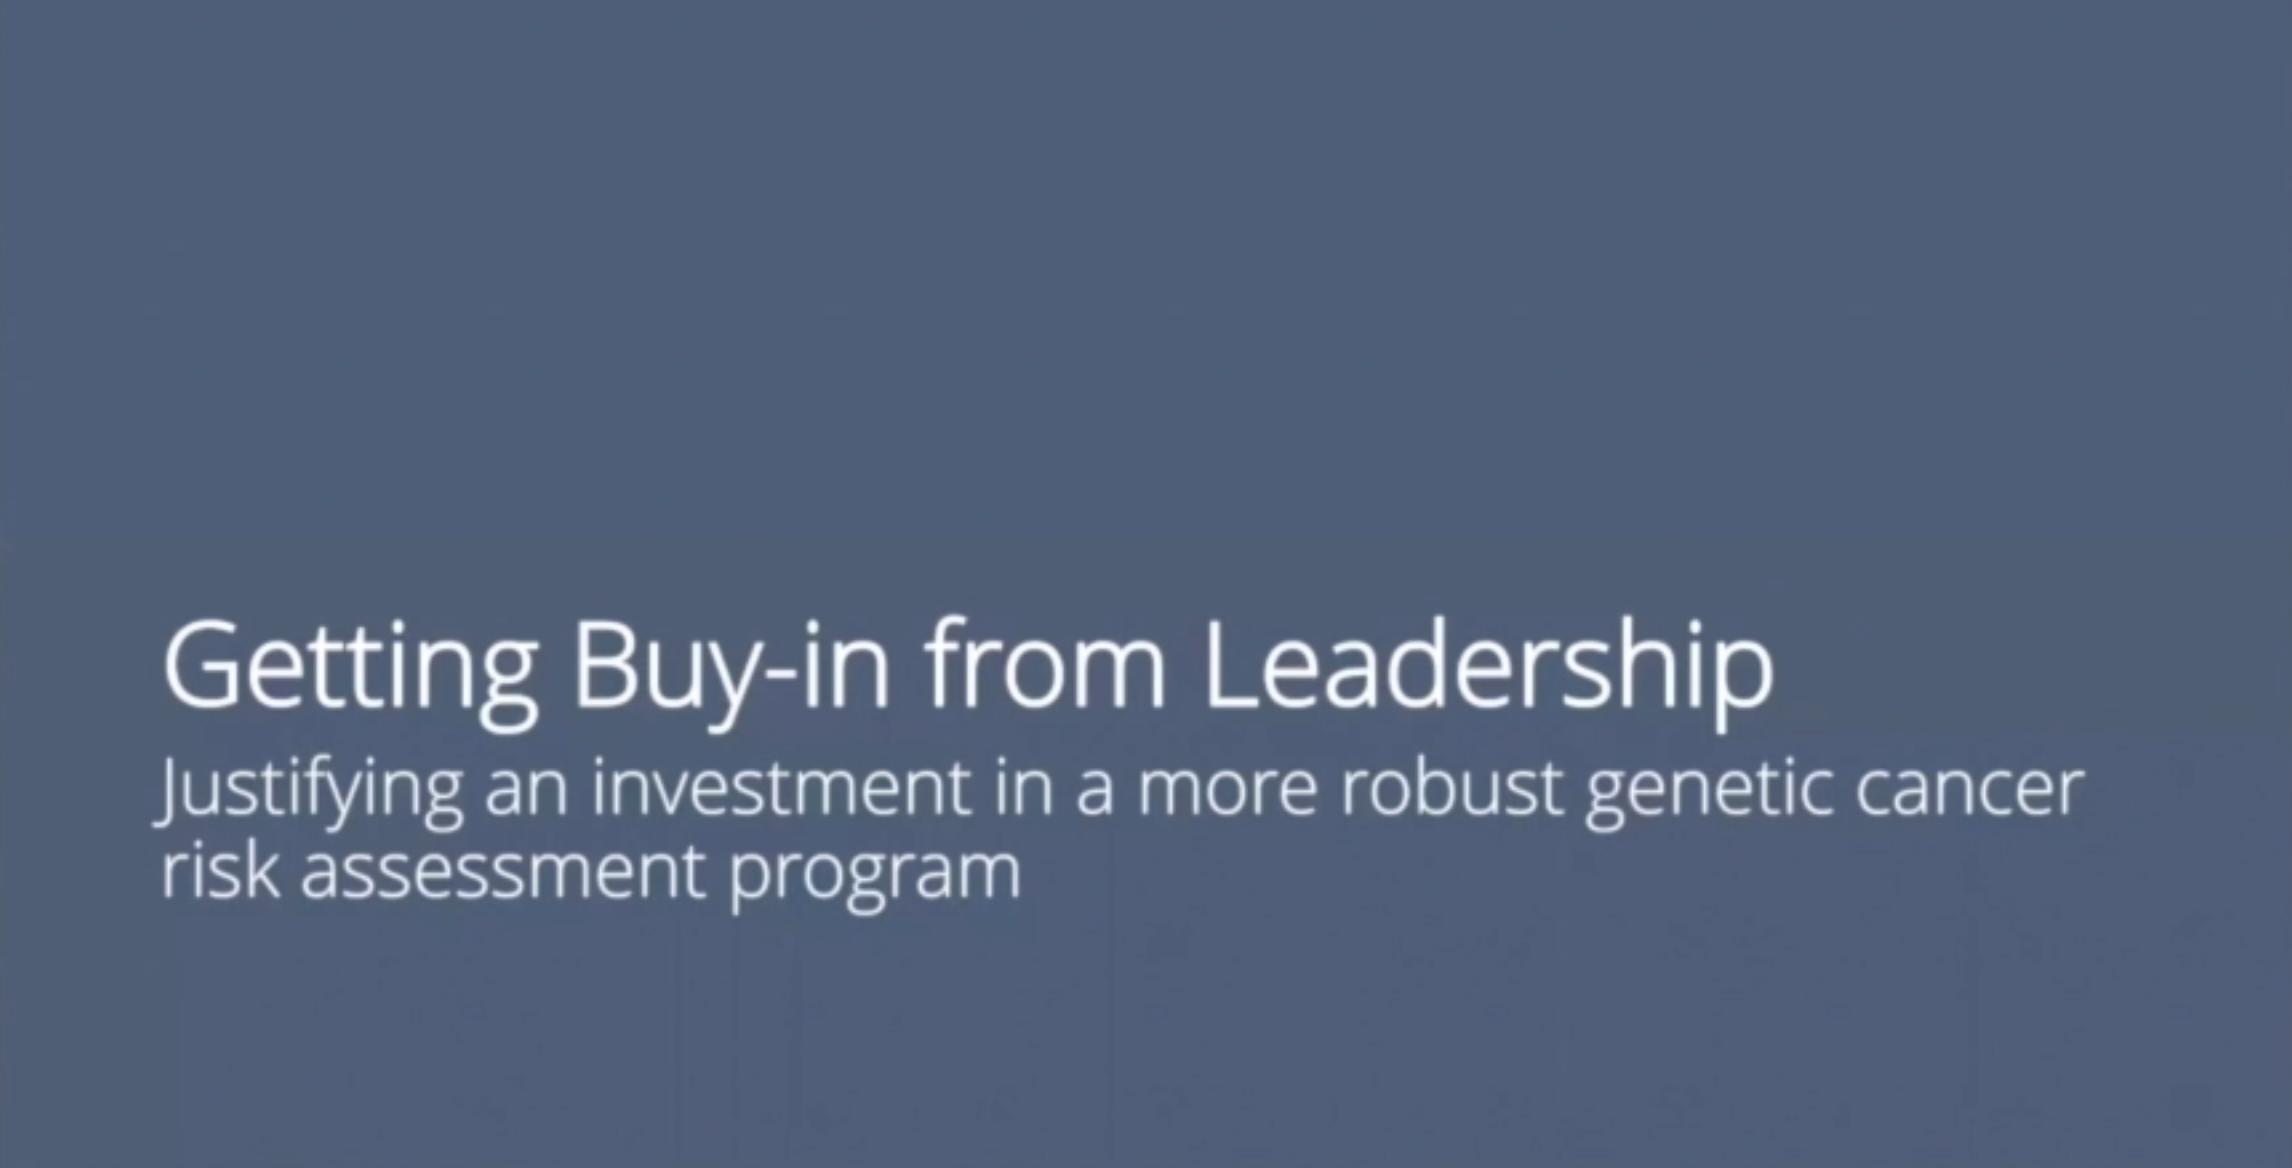 05 Buy-in from leadership